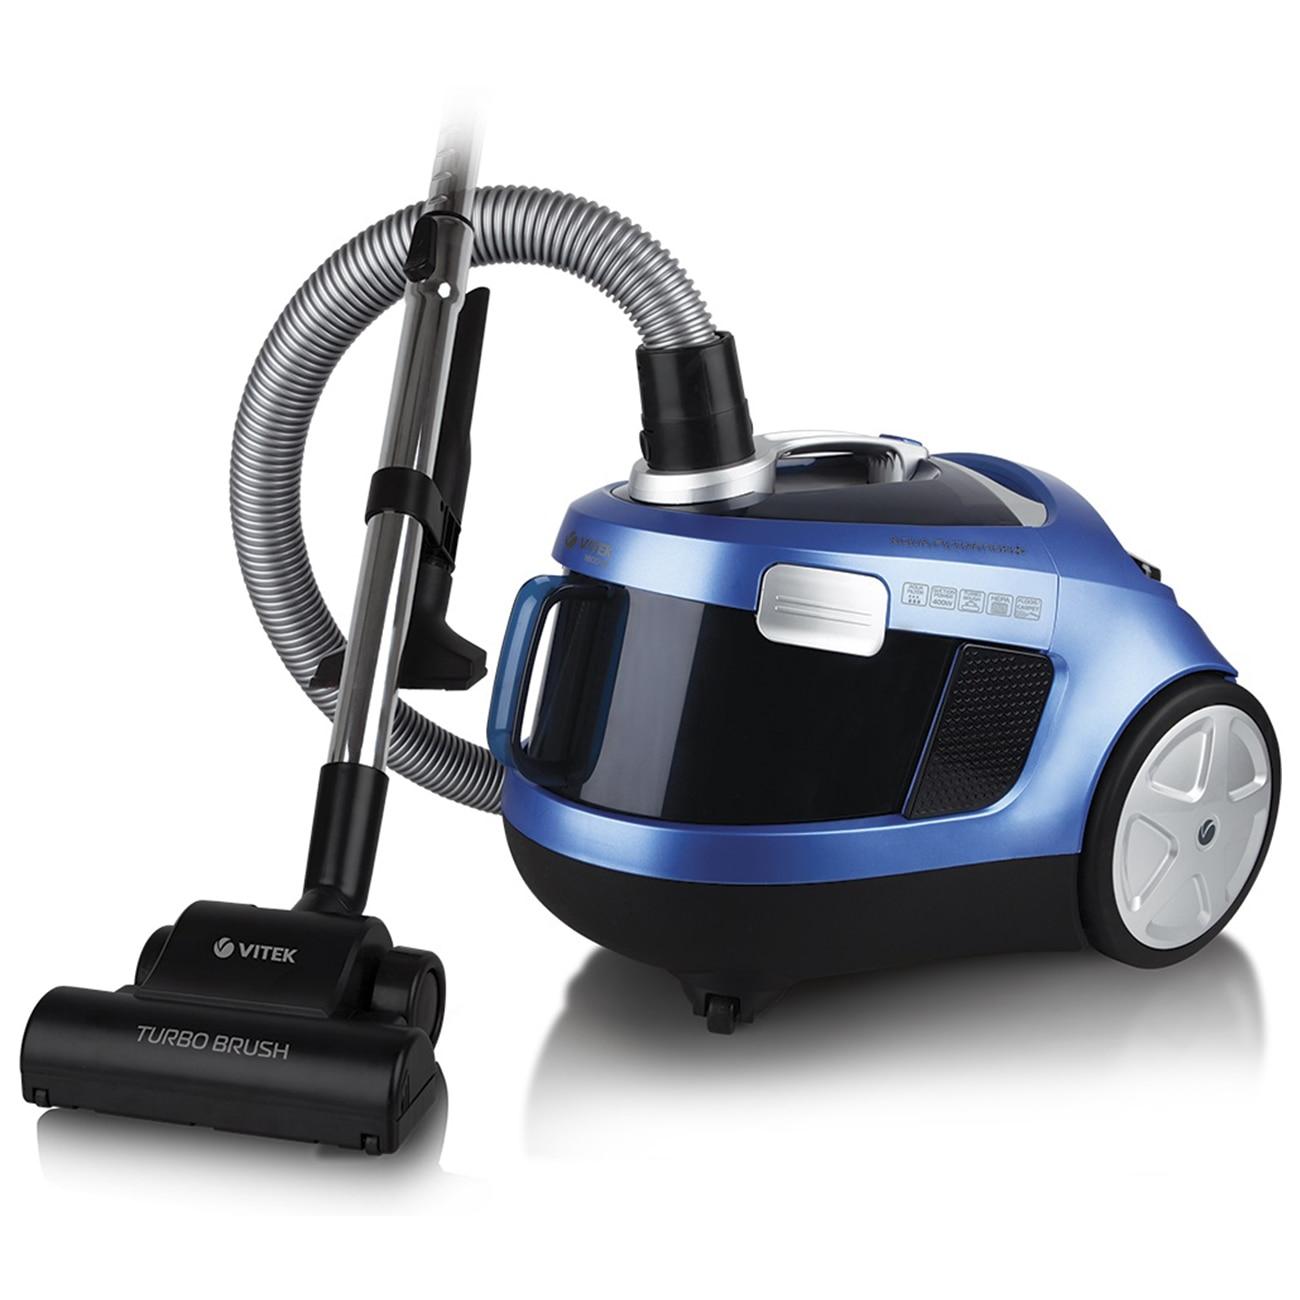 Electric vacuum cleaner Vitek VT-1886 B electric vacuum cleaner vitek vt 1833 pr